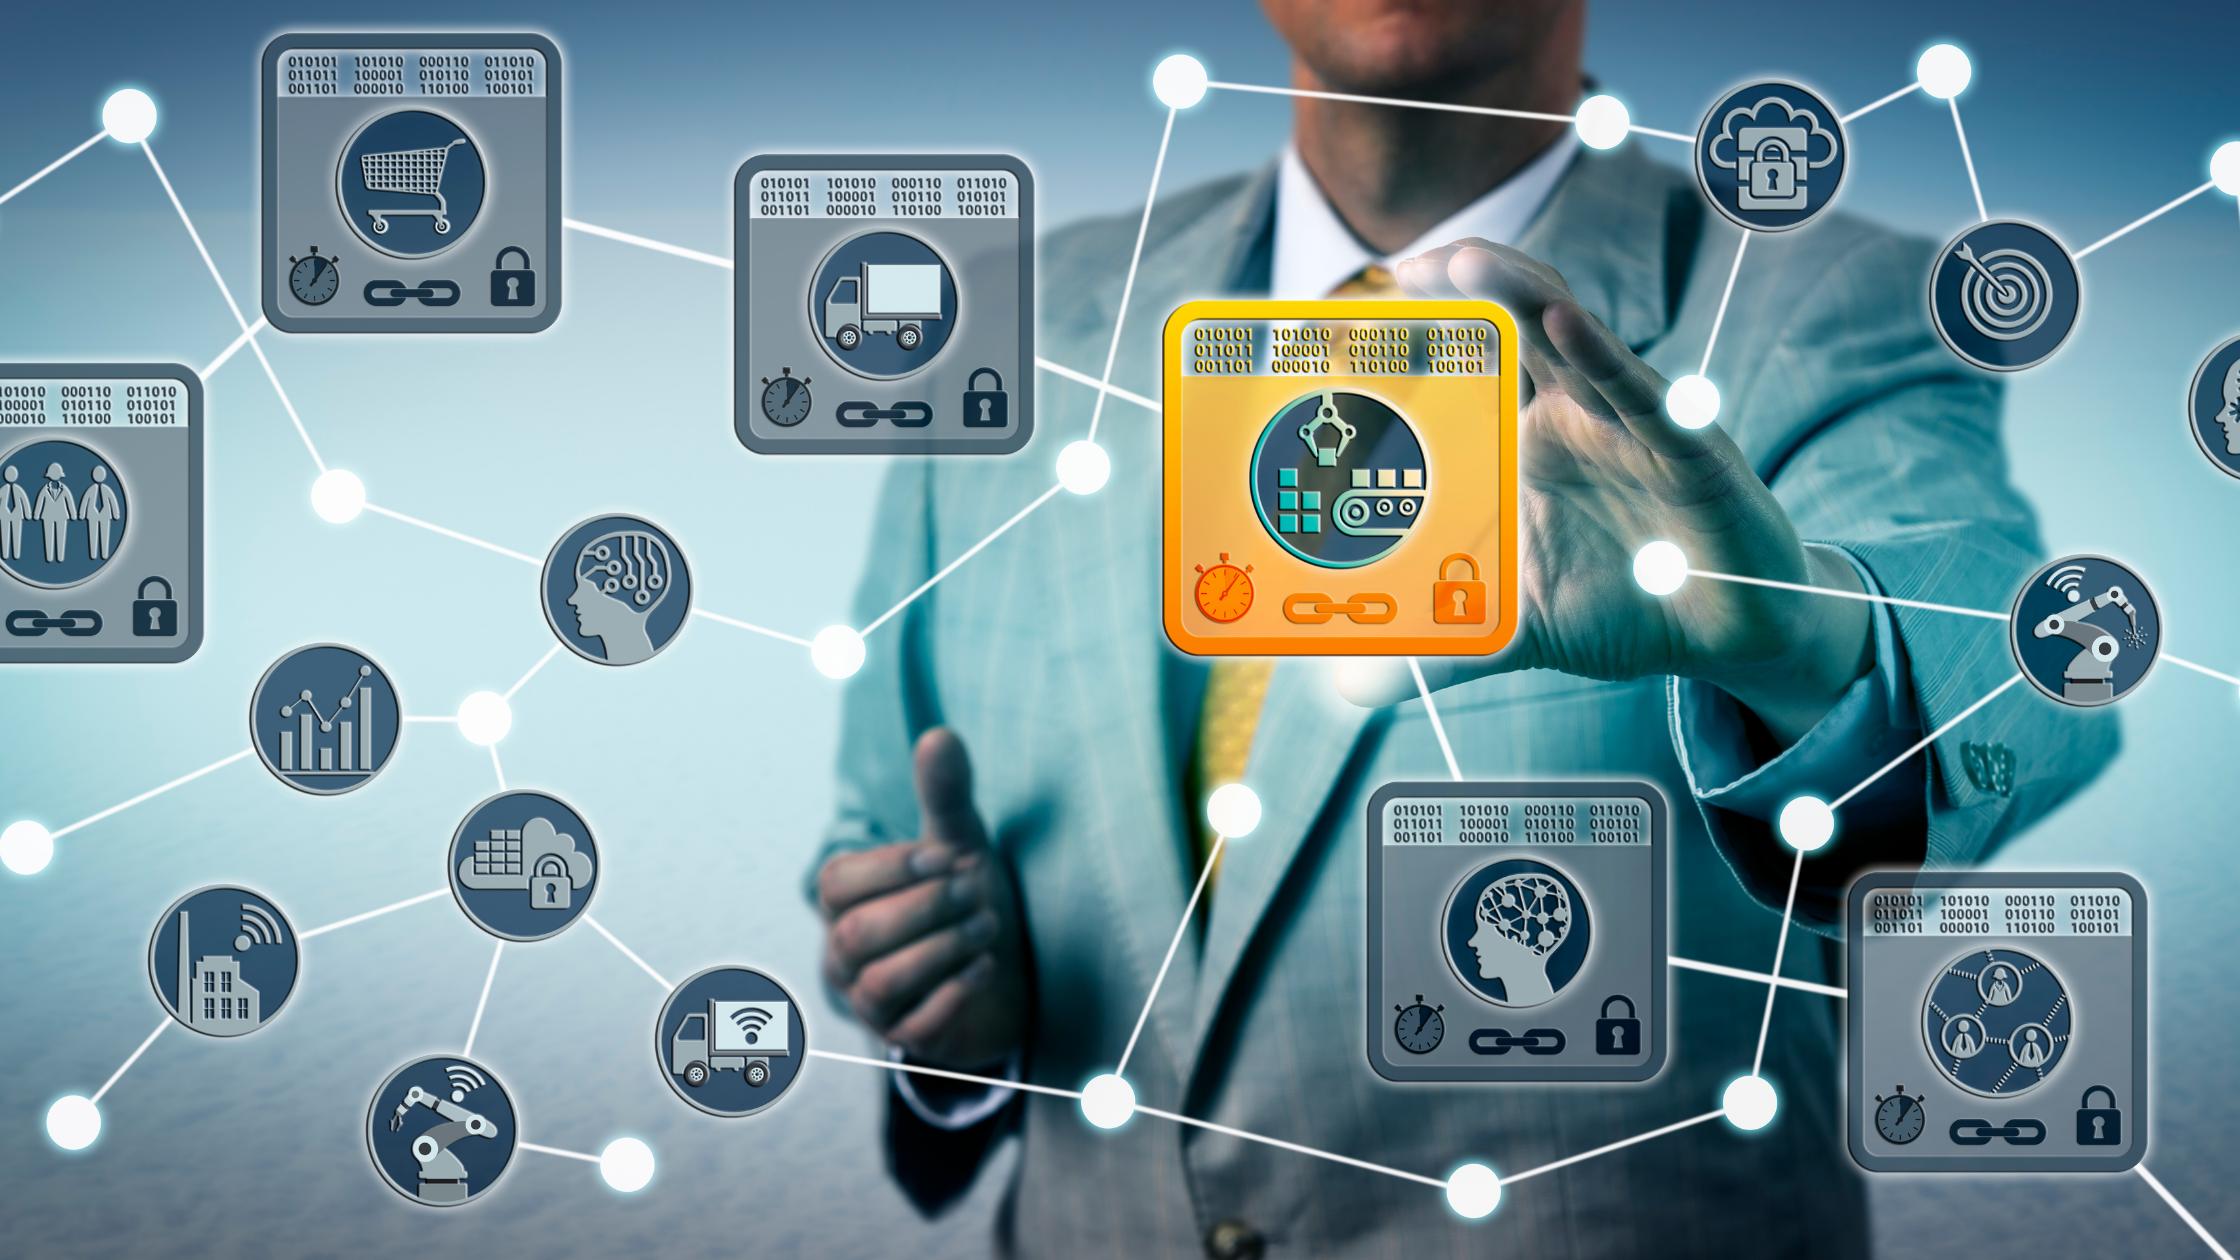 Manage supply chain operations using Data Analytics